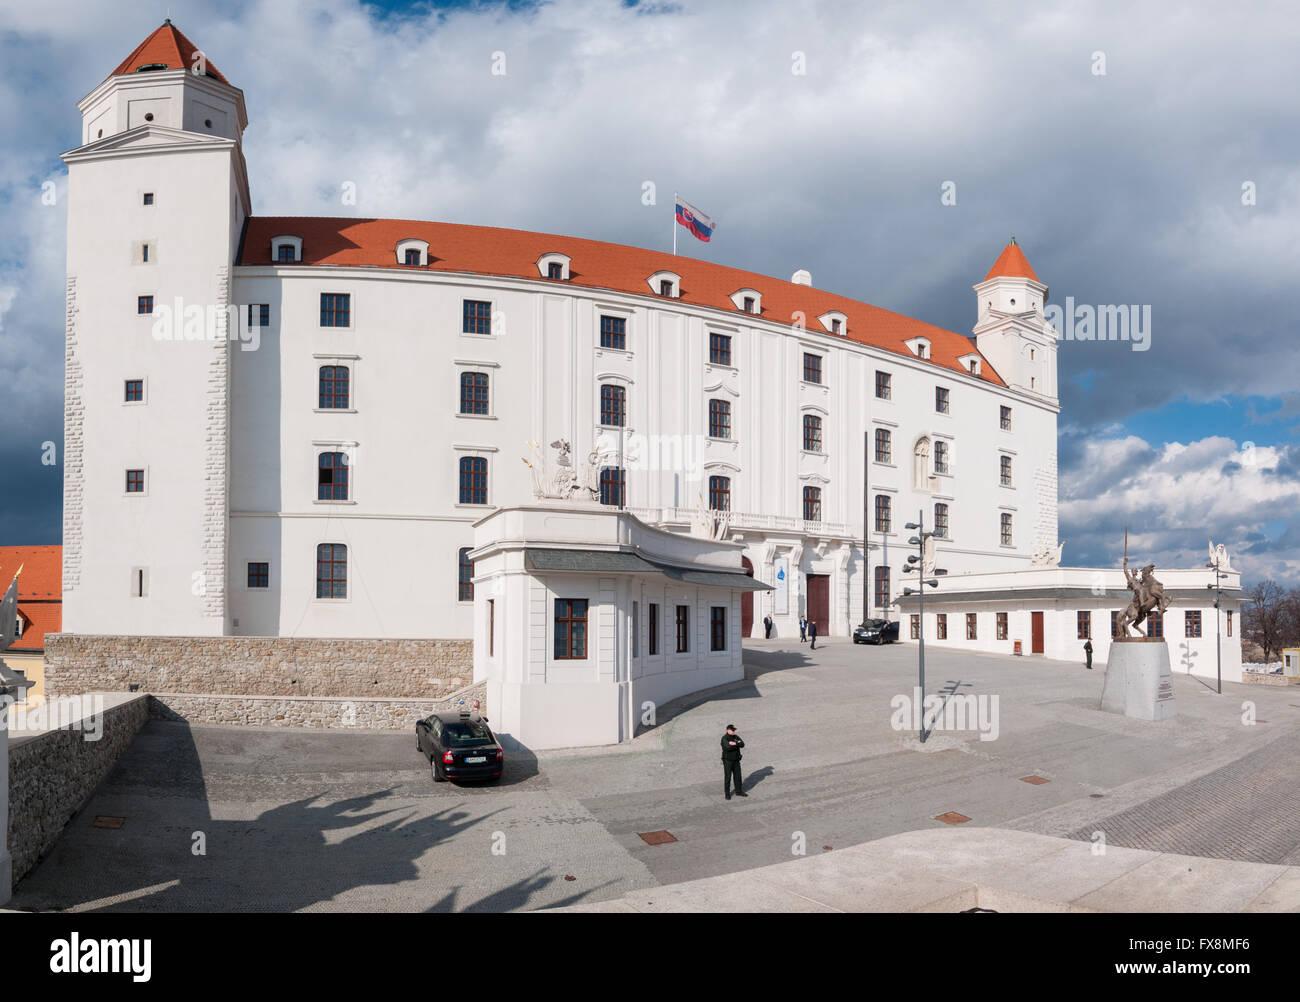 Bratislava Castle, Slovakia - Stock Image